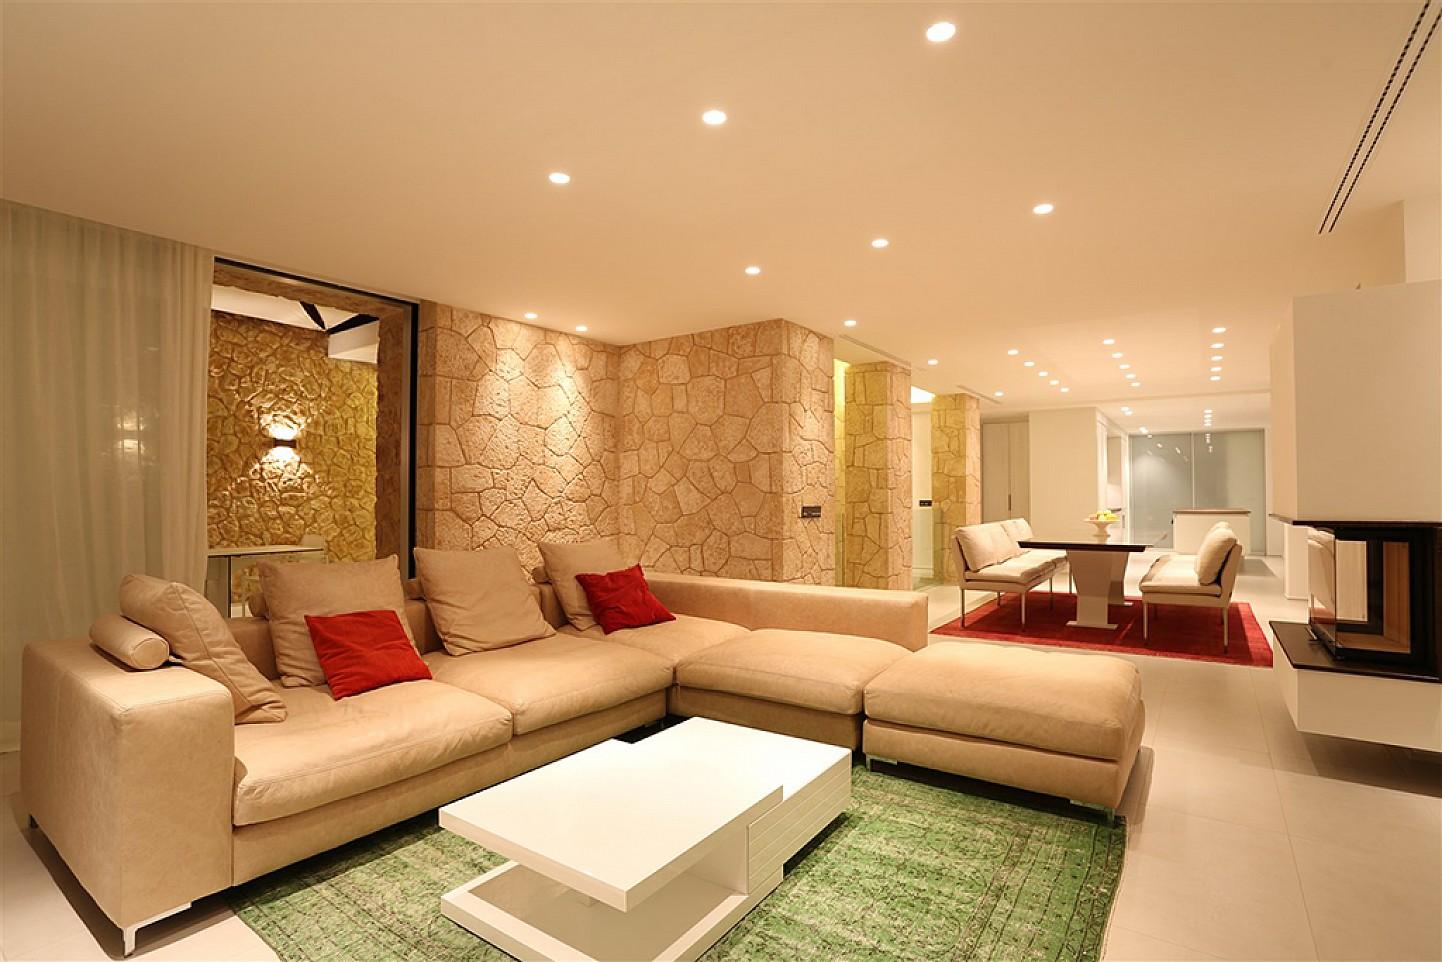 Salón muy espacioso con buena iluminación